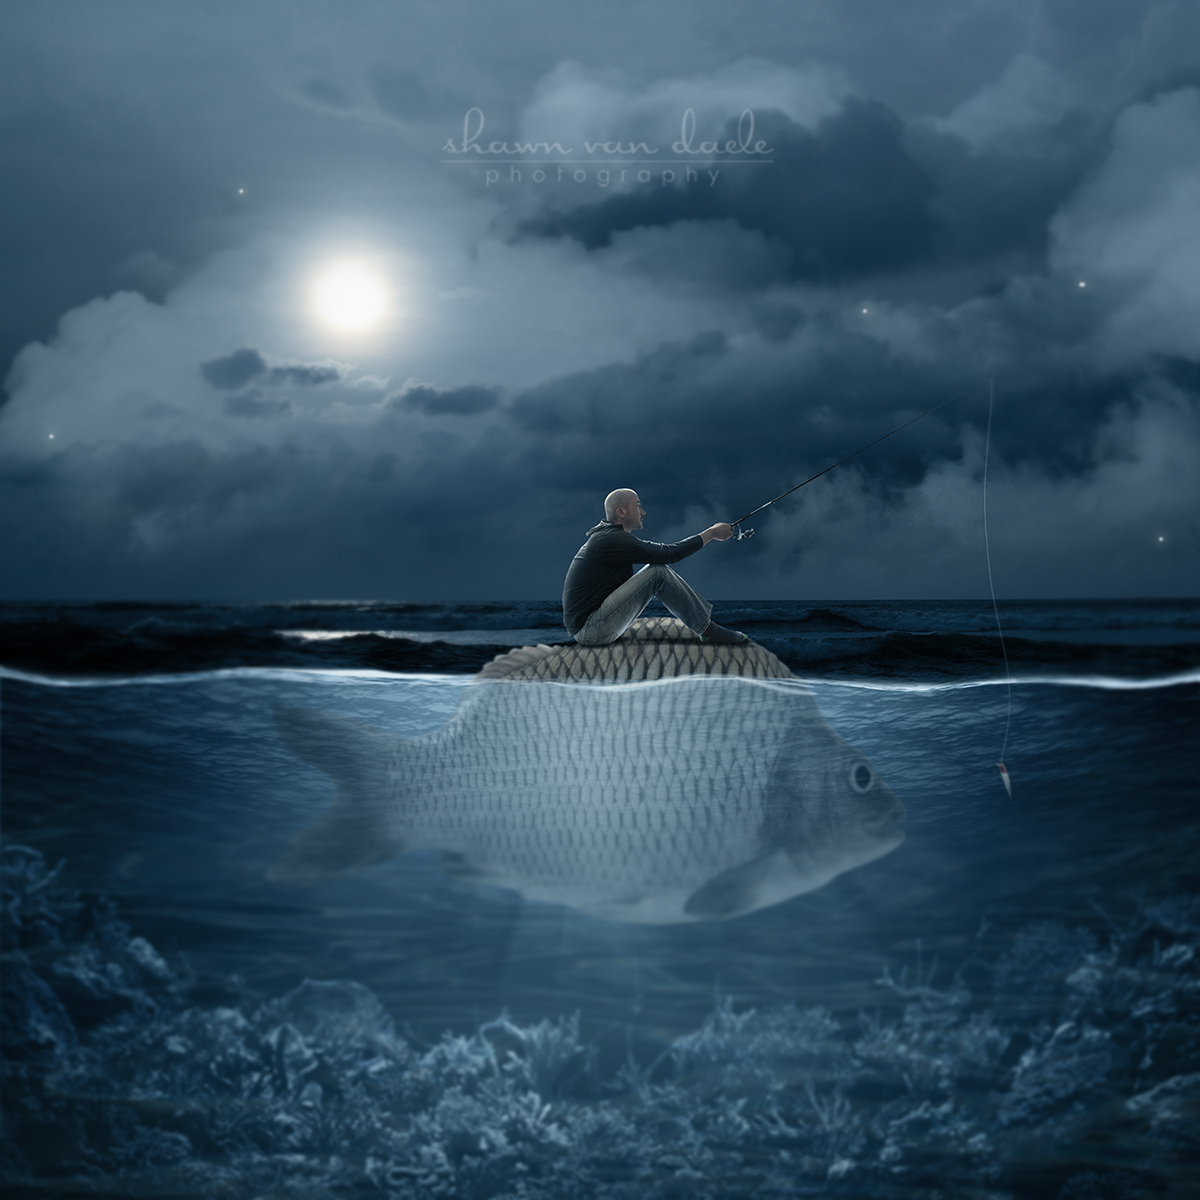 11.10.13-FishingForMemories_flate_FB.jpg